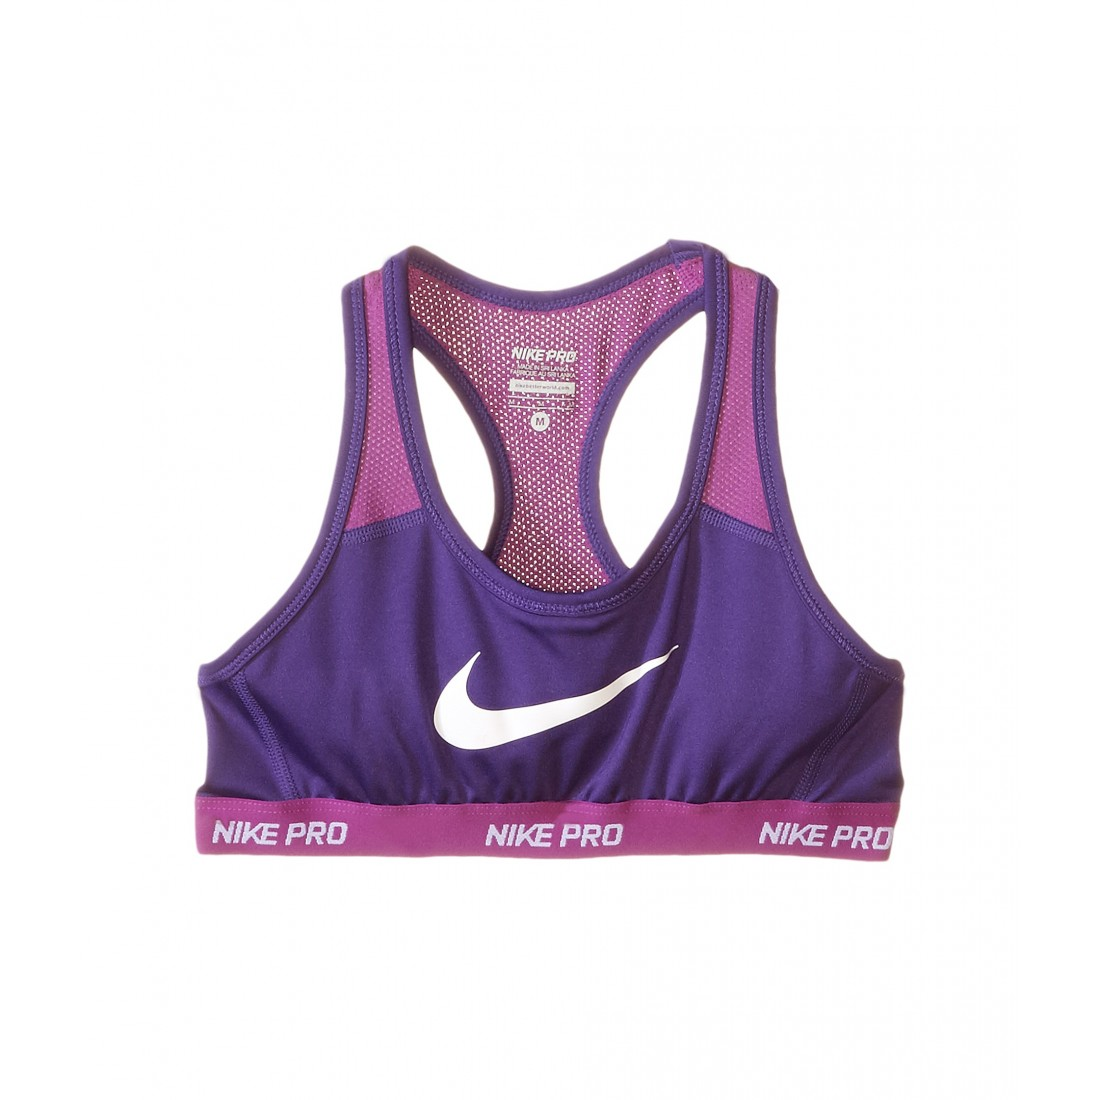 official photos 96c32 c4698 Nike Kids Pro Hypercool Sports Bra (Little Kids Big Kids) 6PM8466204 Court  Purple